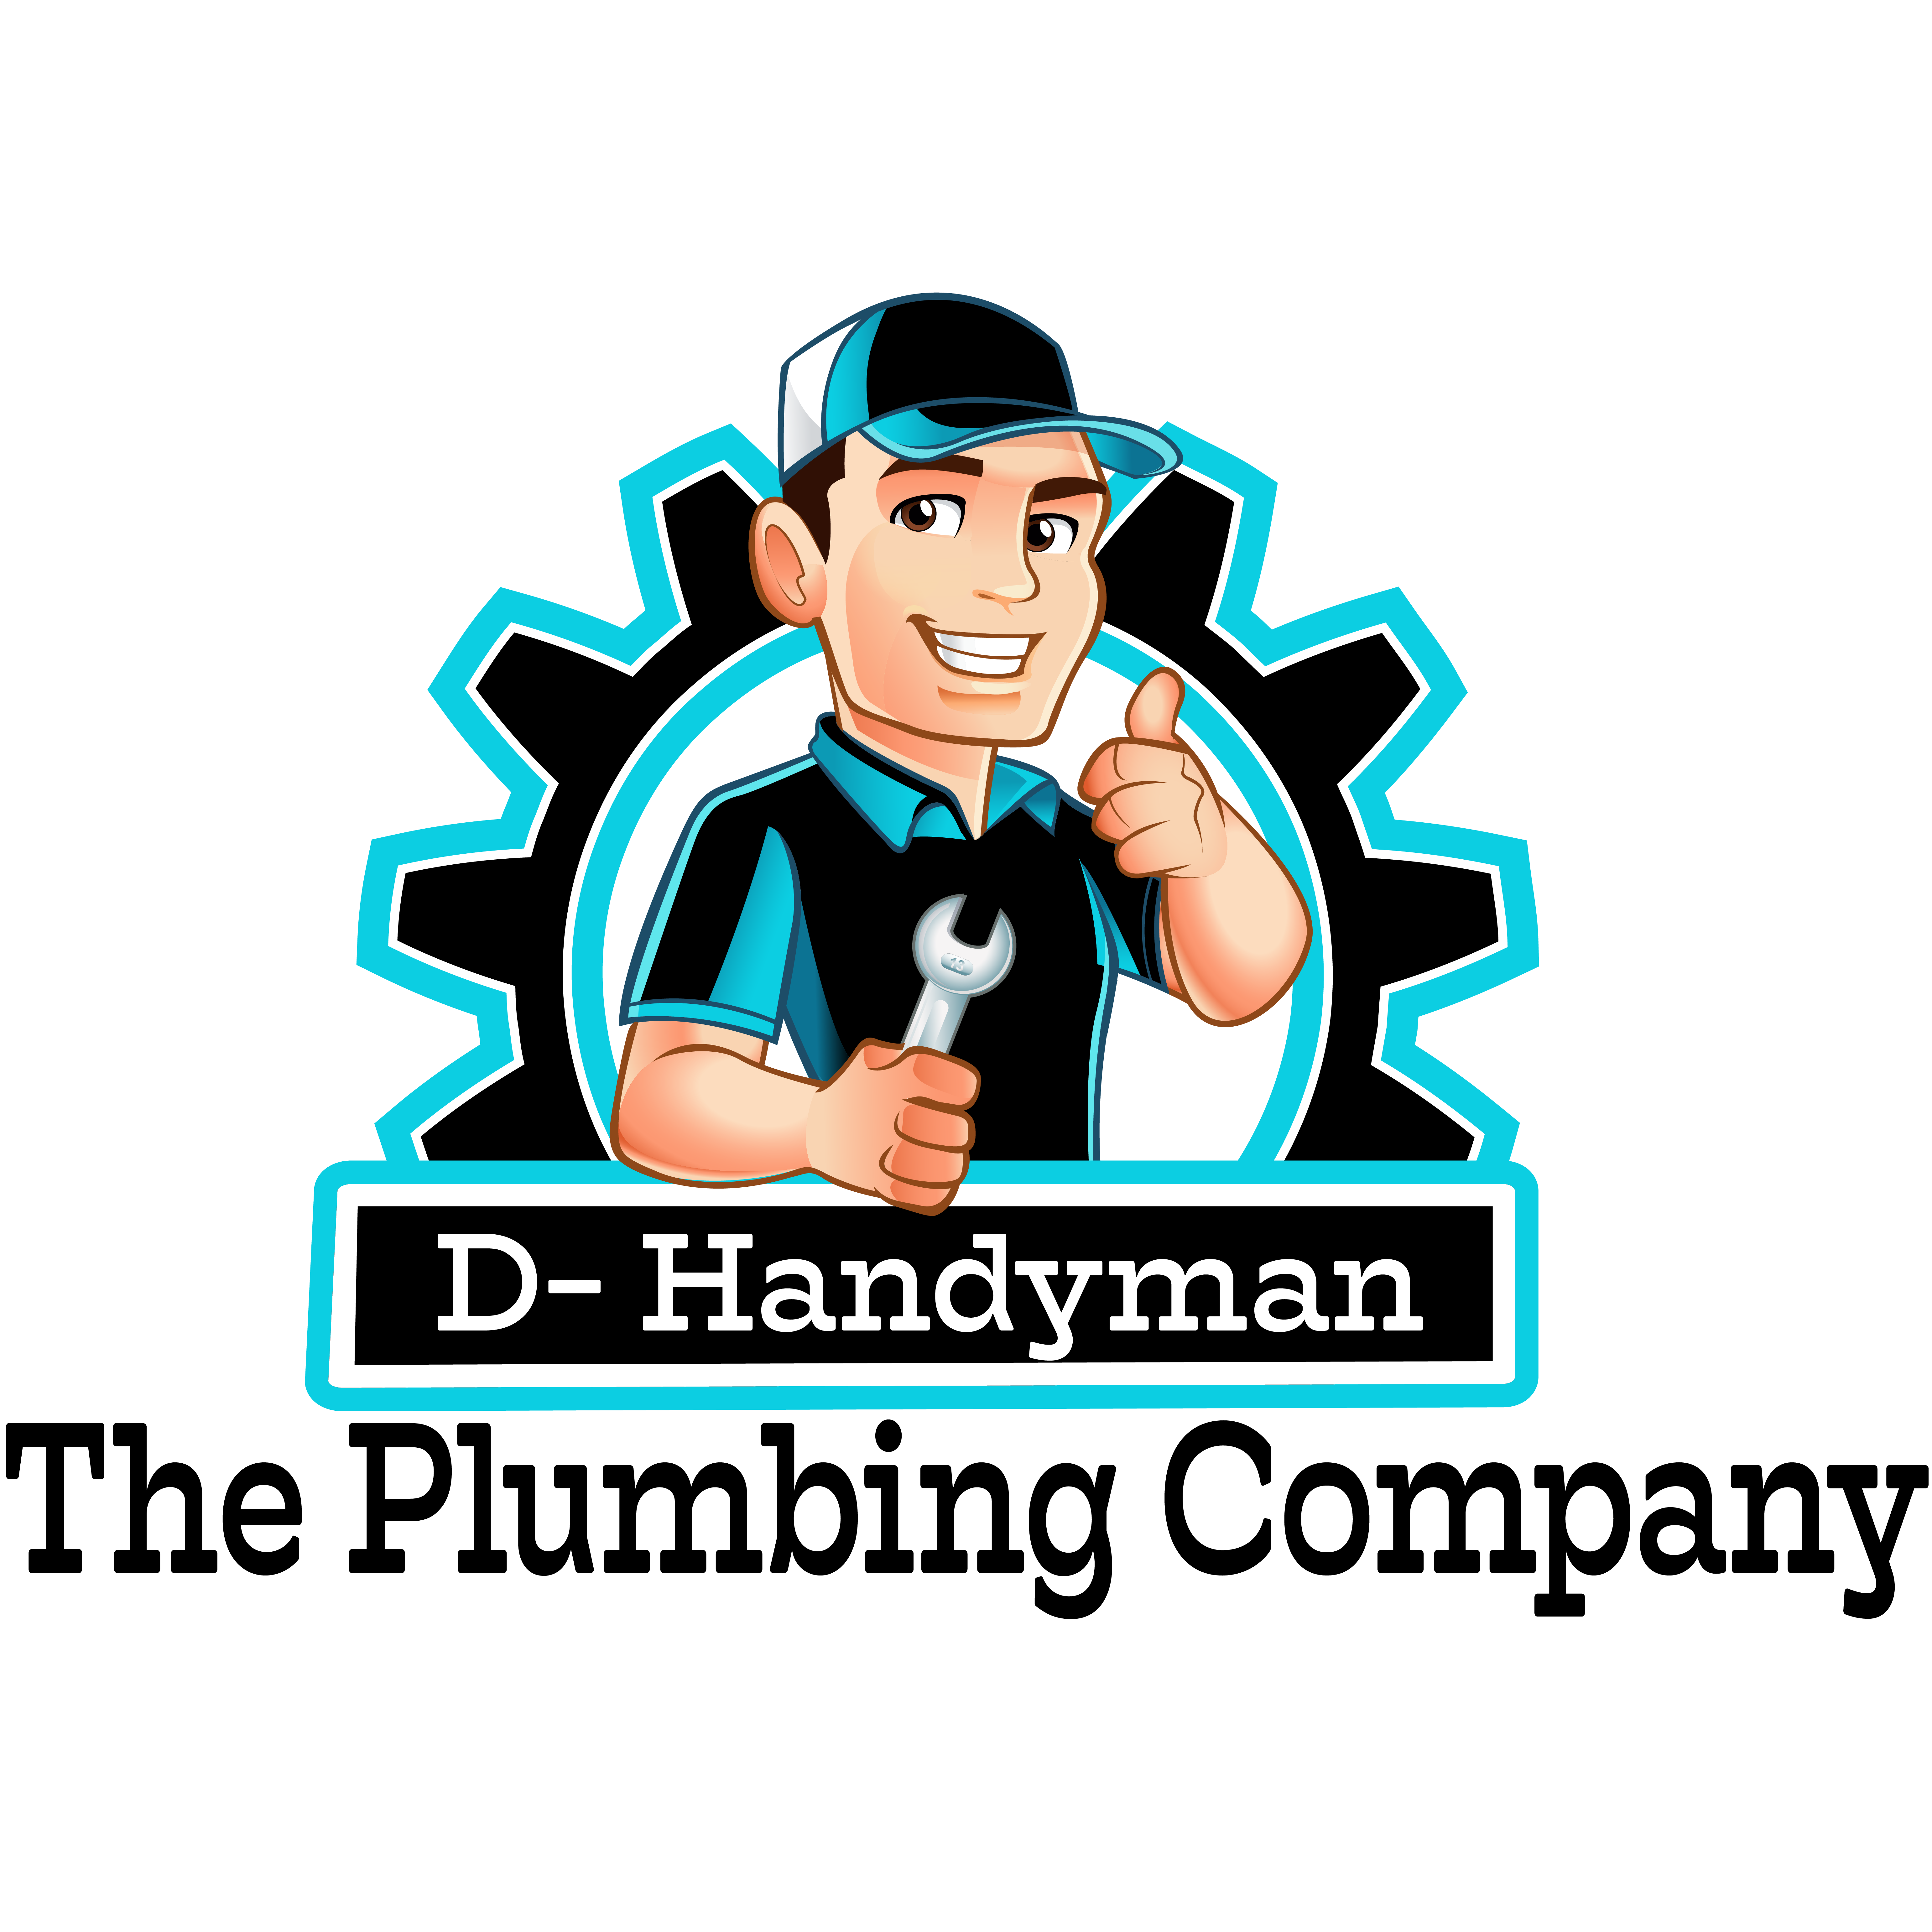 D-Handyman The Plumbing Company